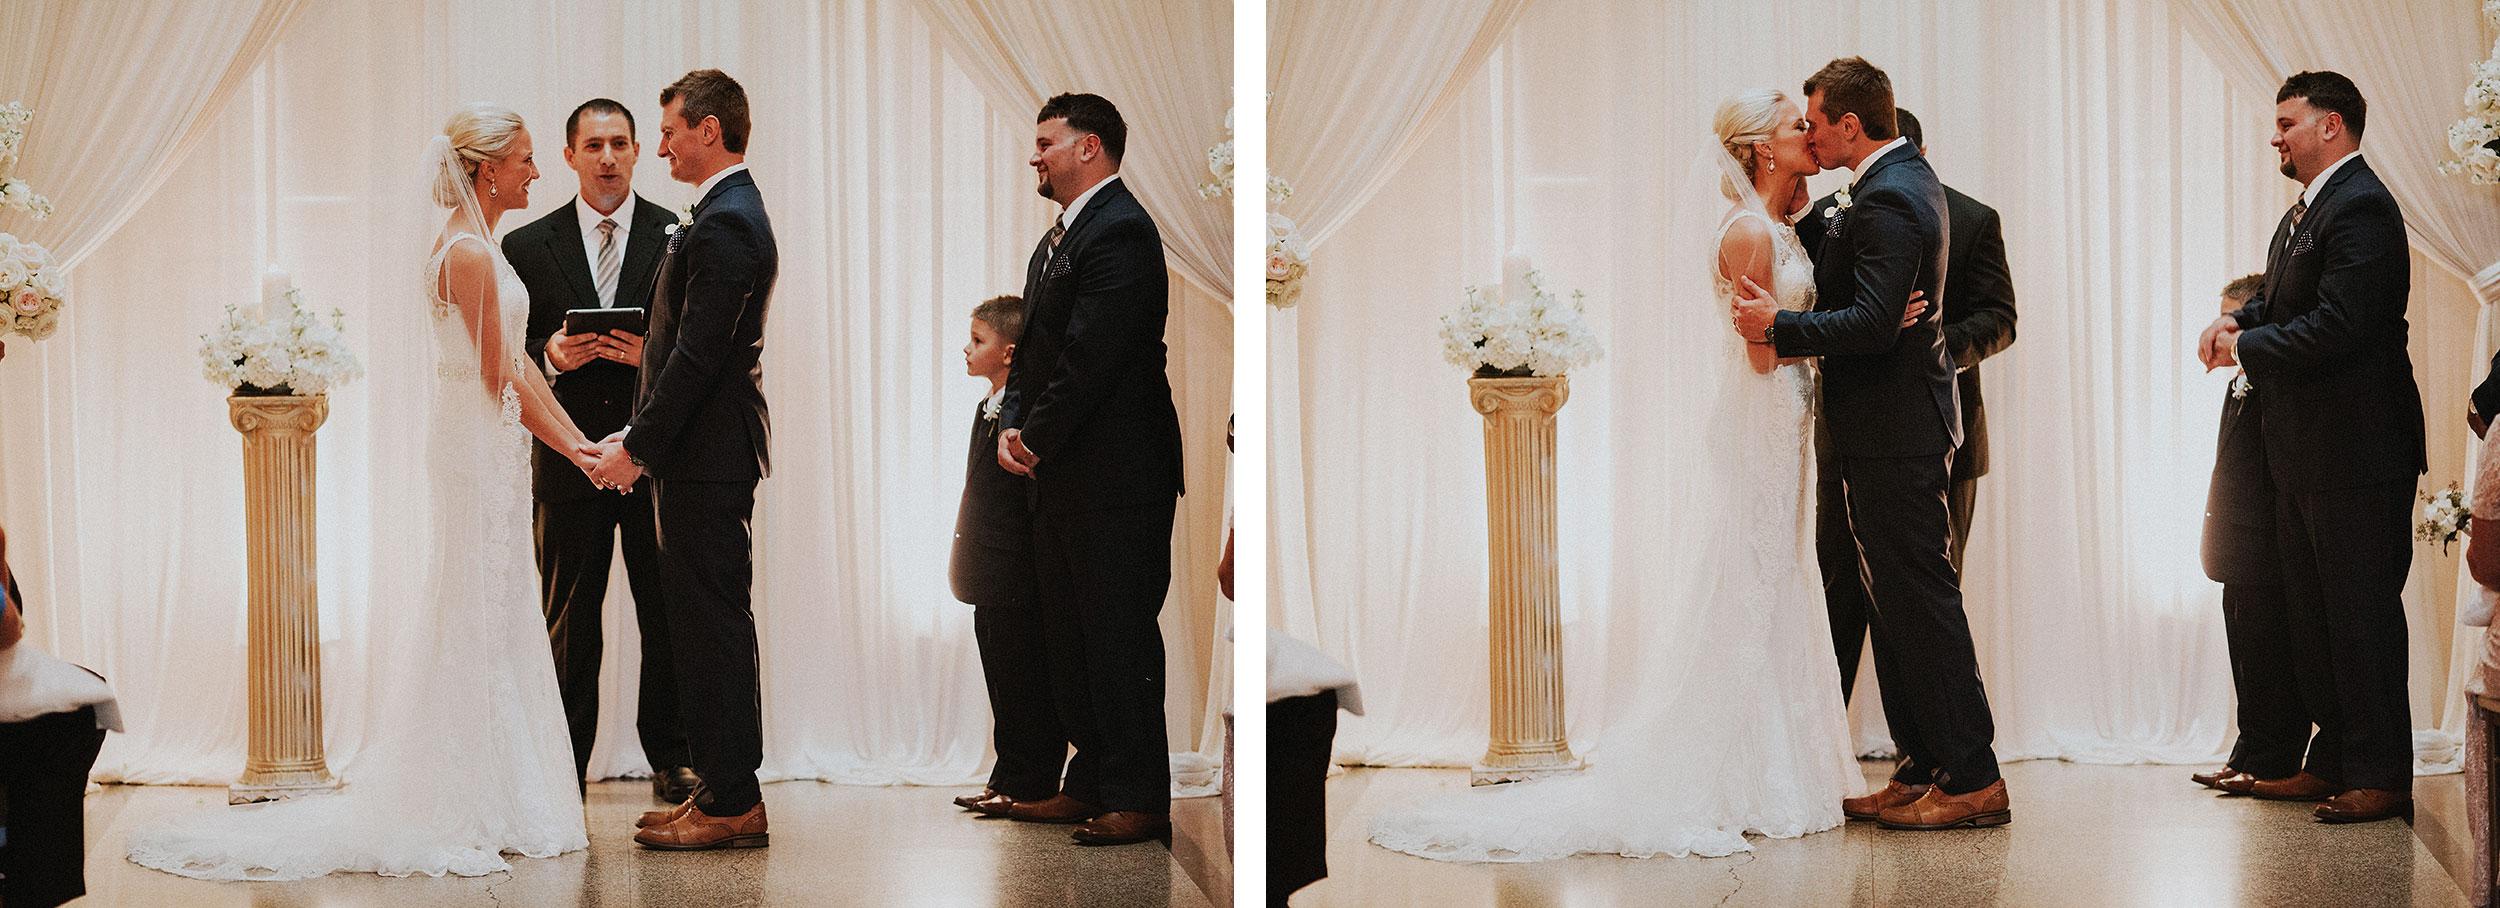 olmsted-wedding-louisville-kentucky-030.JPG